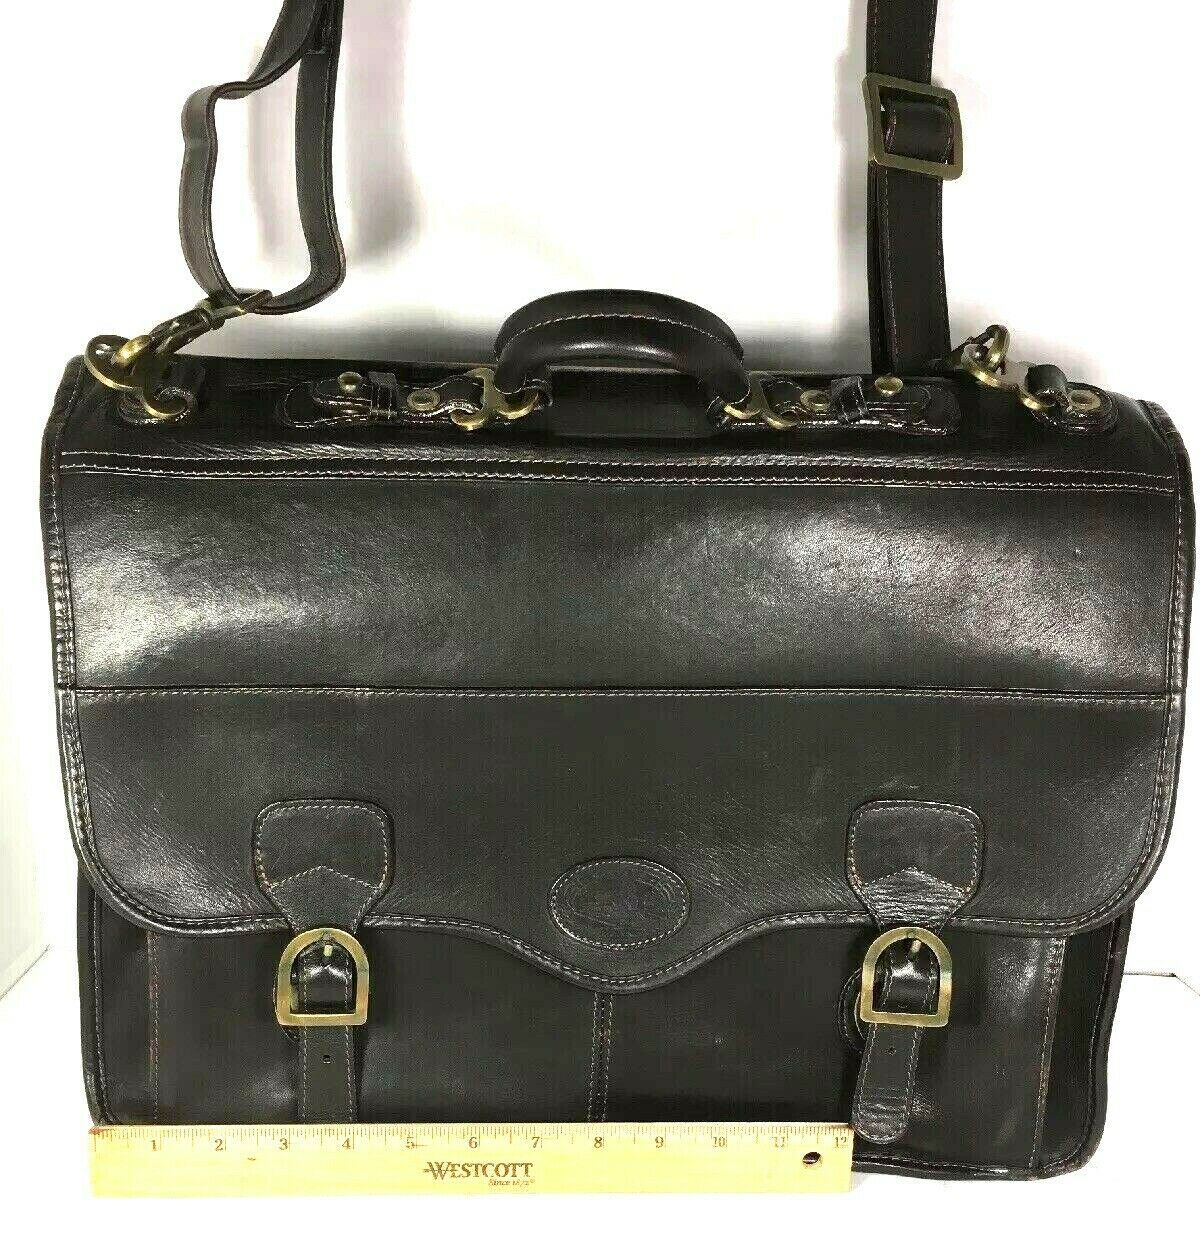 Santa Fe Dilana Vintage Dark Brown Leather Briefcase Laptop Bag – Distressed image 4